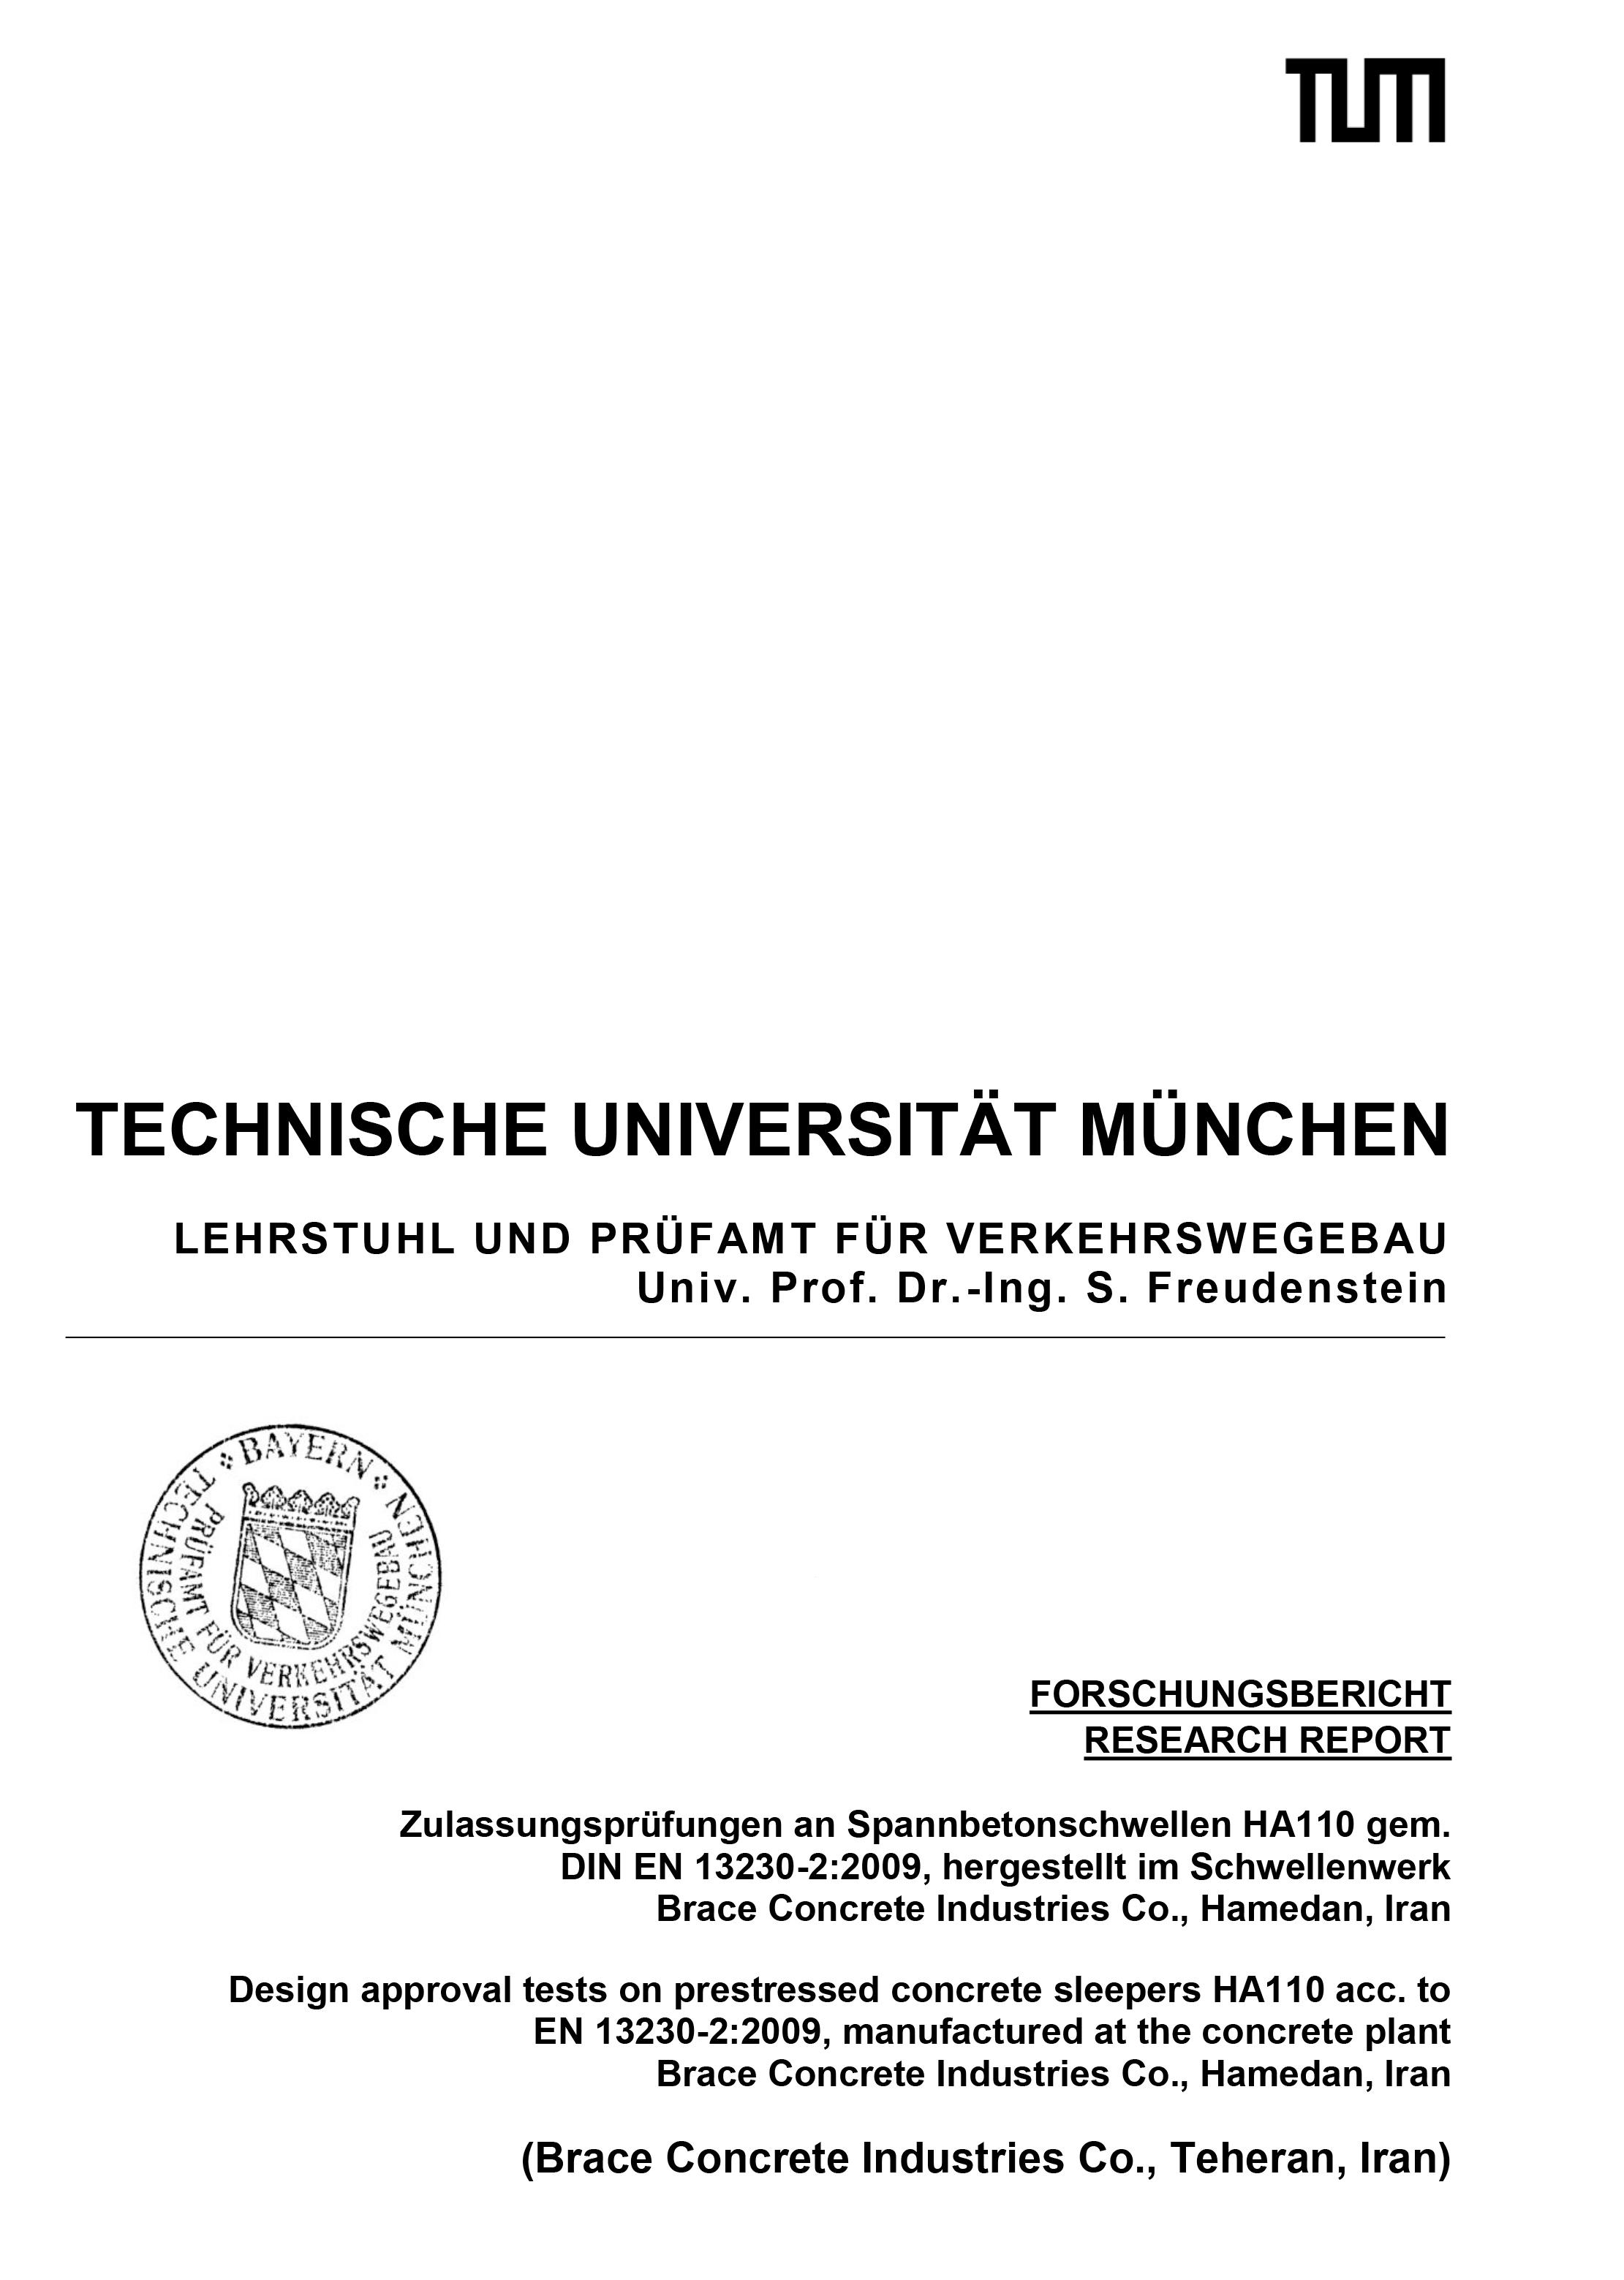 Certificate Of University of Munich – HA110